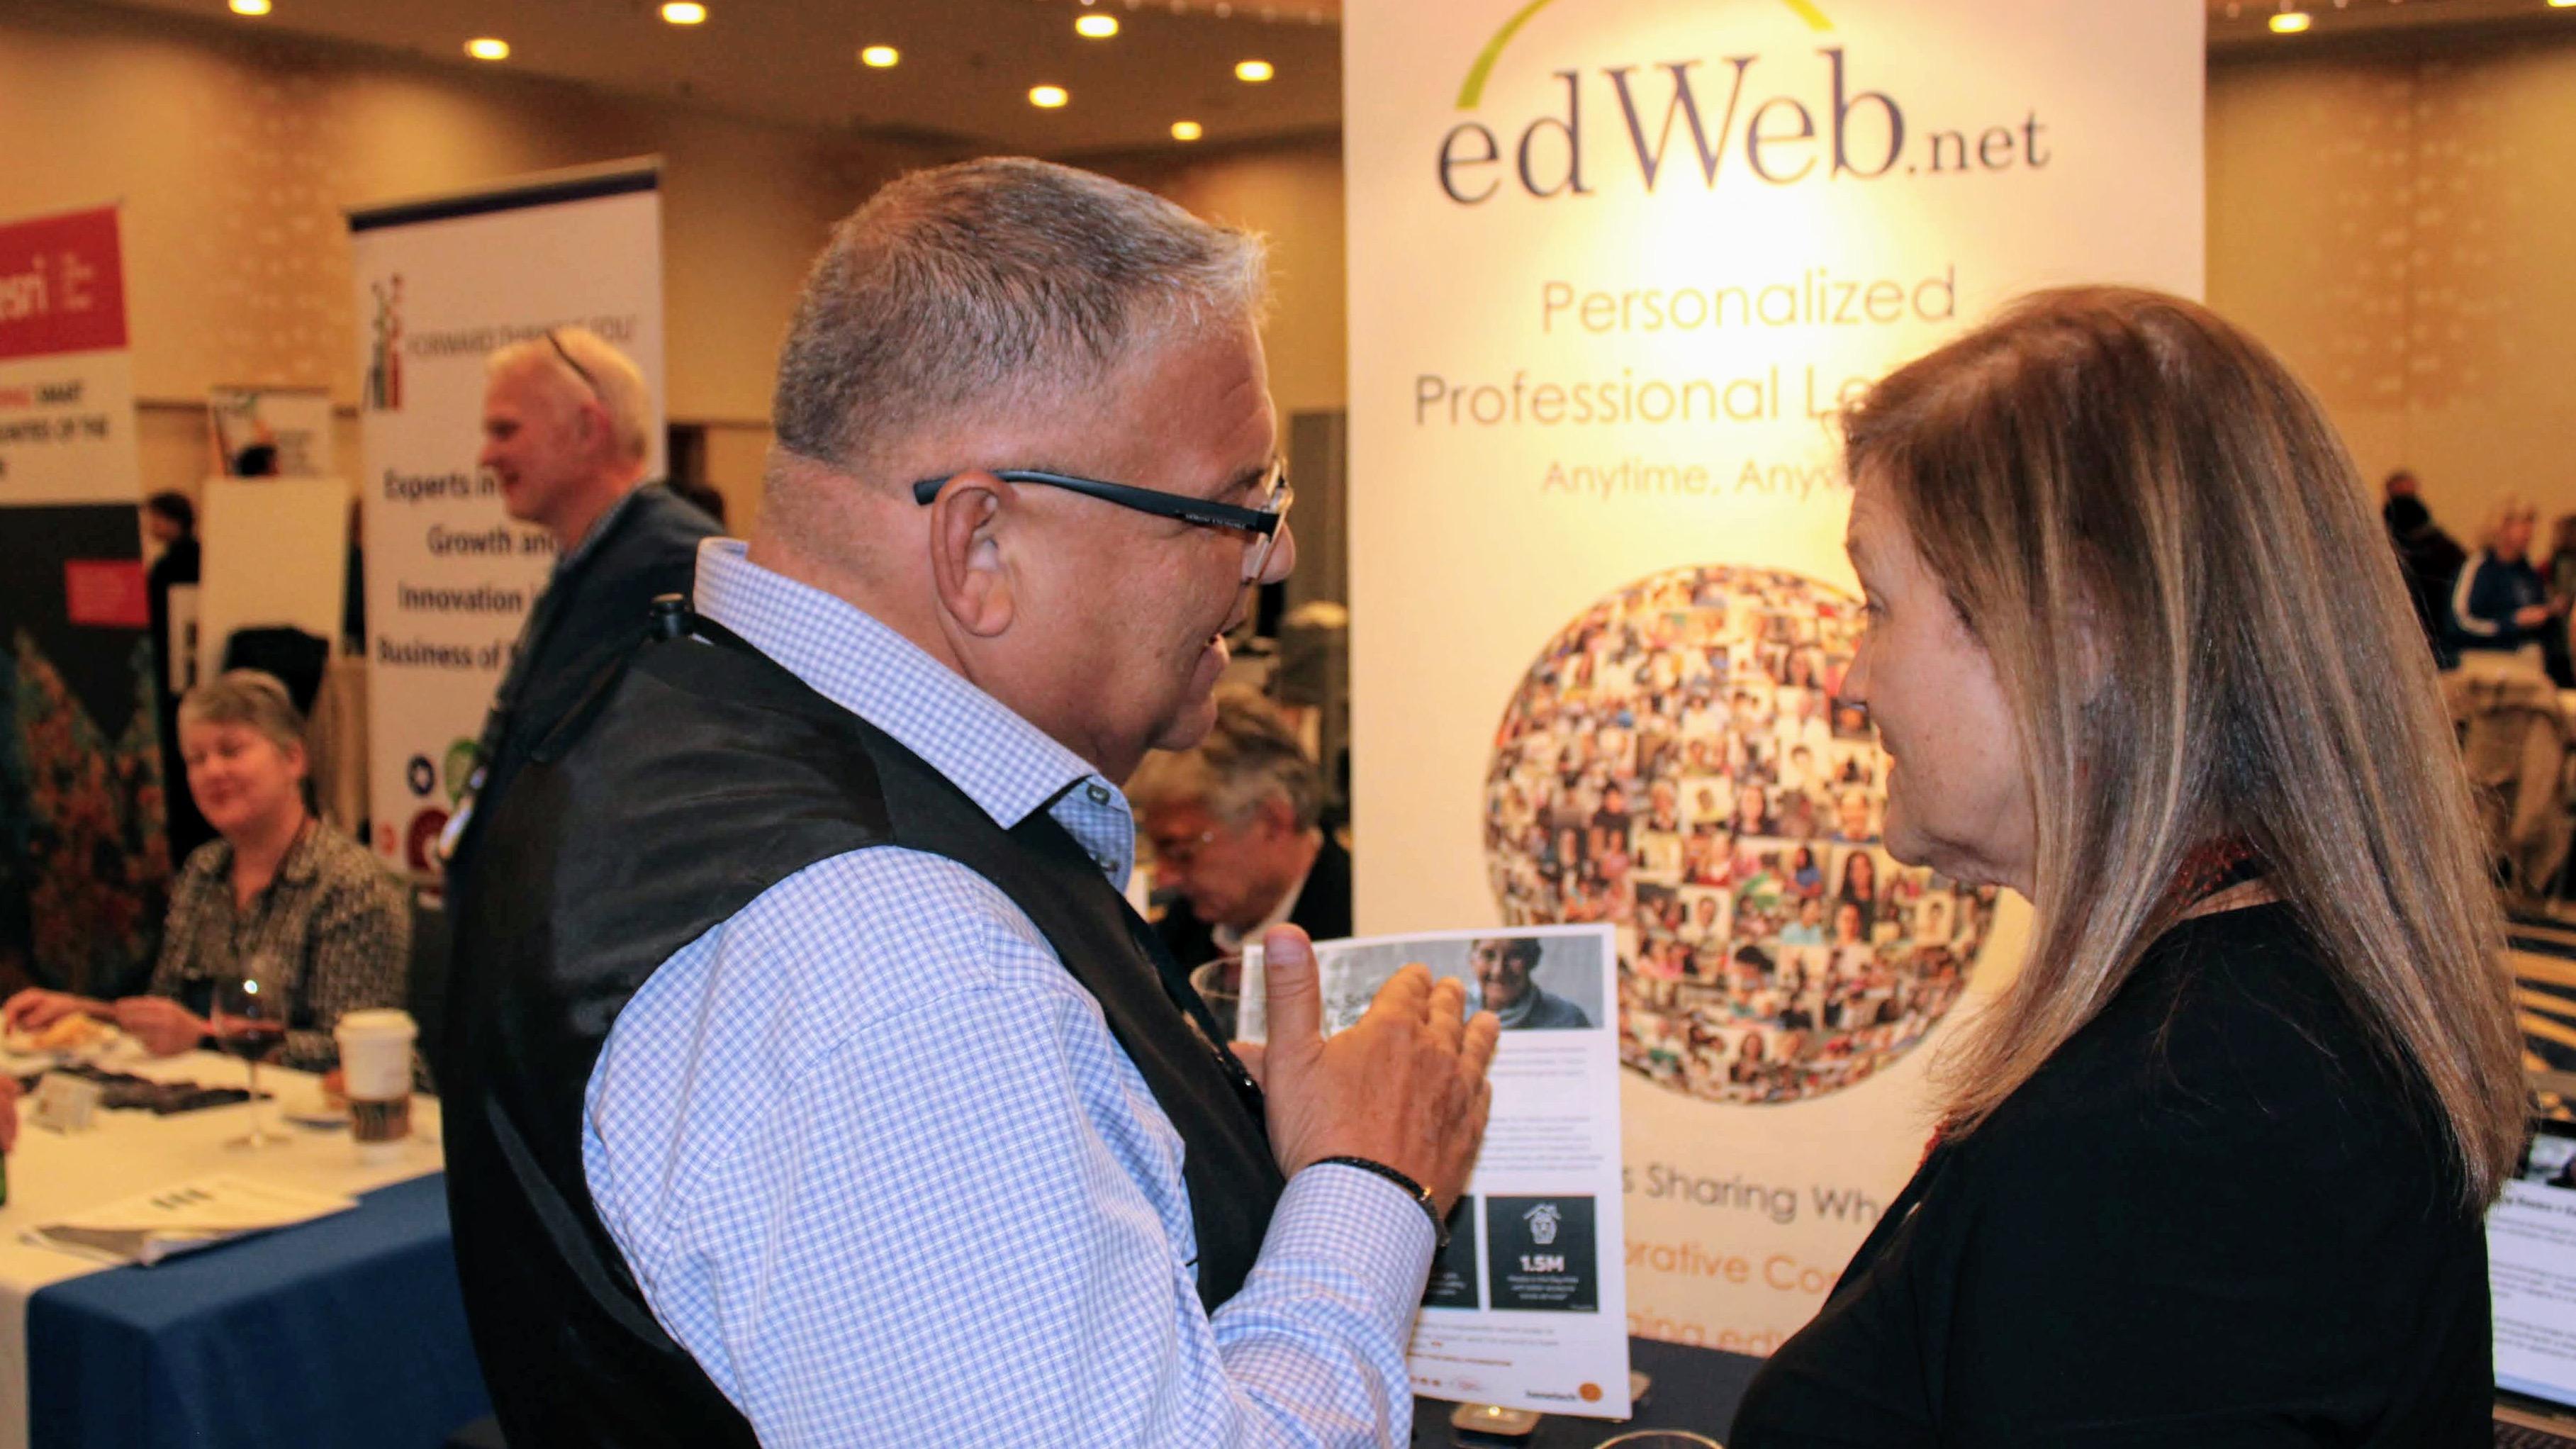 Partner reception conversation with edWeb banner